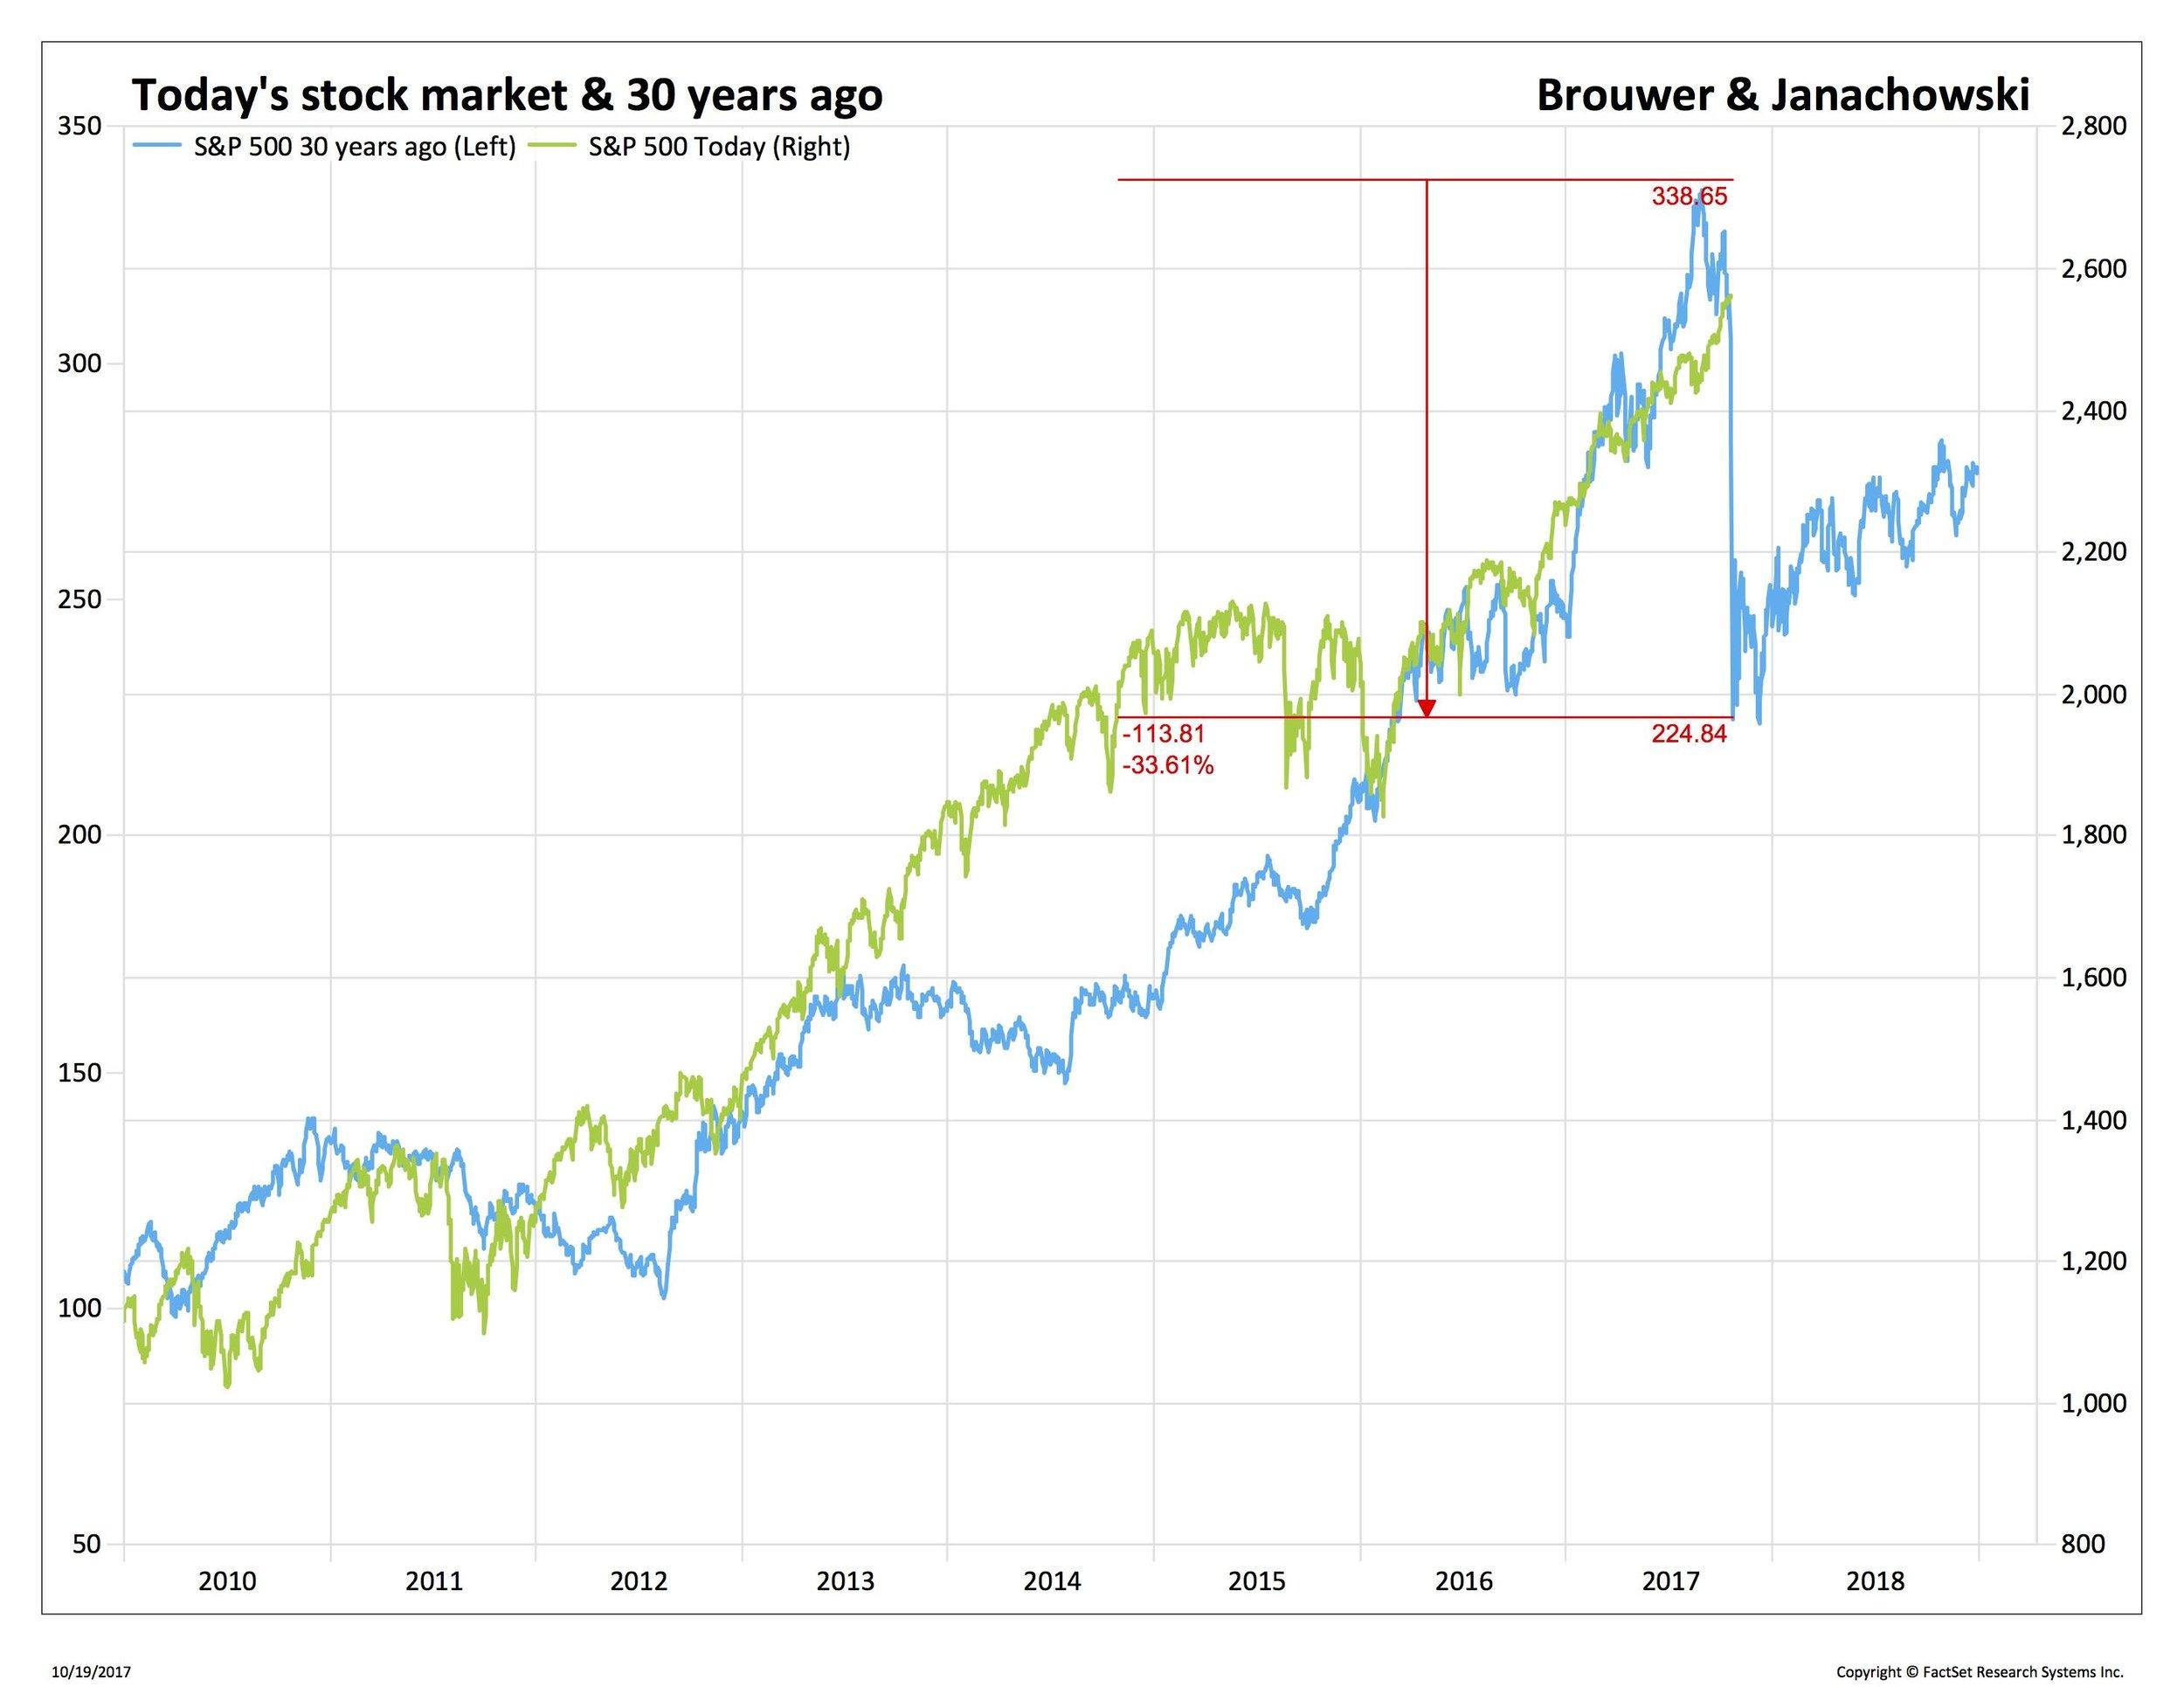 Blog 3 10-19-17 ECON - Sep - S&P 500 today vs. 30 years ago_.jpg